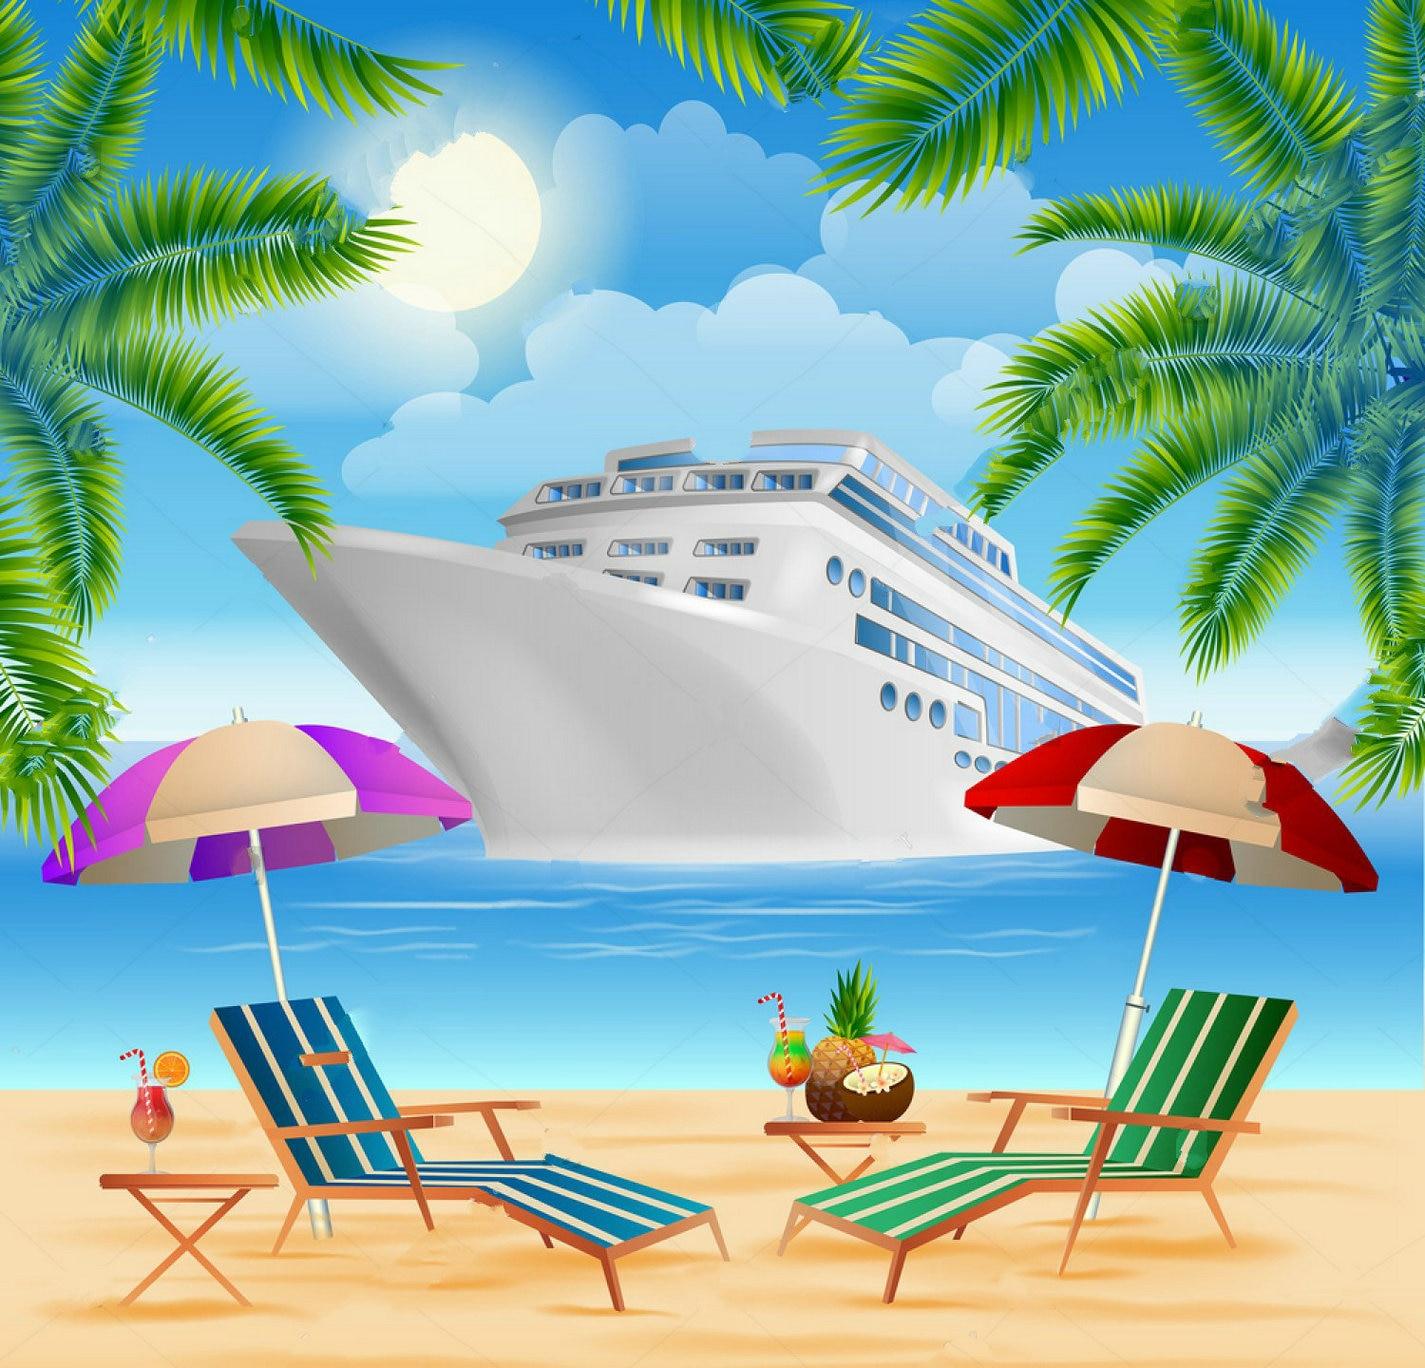 Party Island Beach: Cruise Ship Exotic Island Palm Trees Sea Beach Full Moon